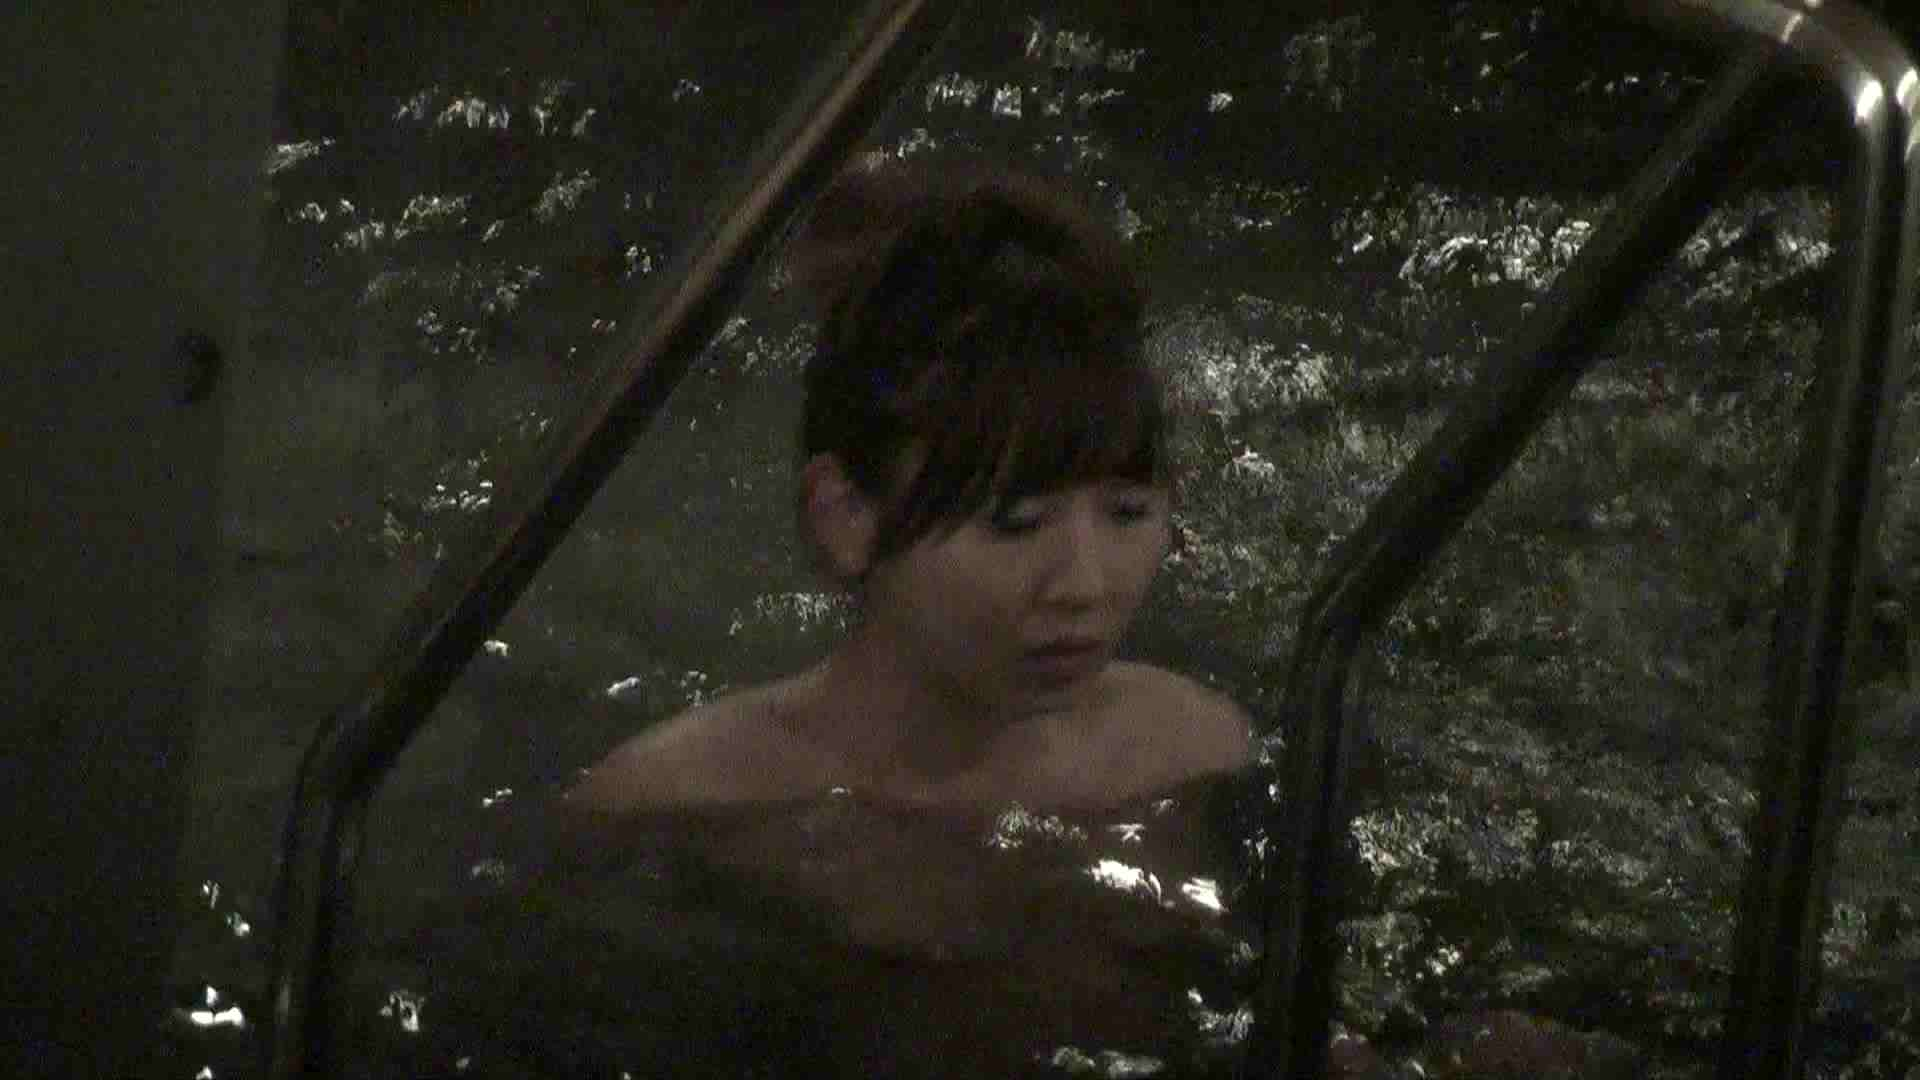 Aquaな露天風呂Vol.410 盗撮   OLエロ画像  29PICs 28